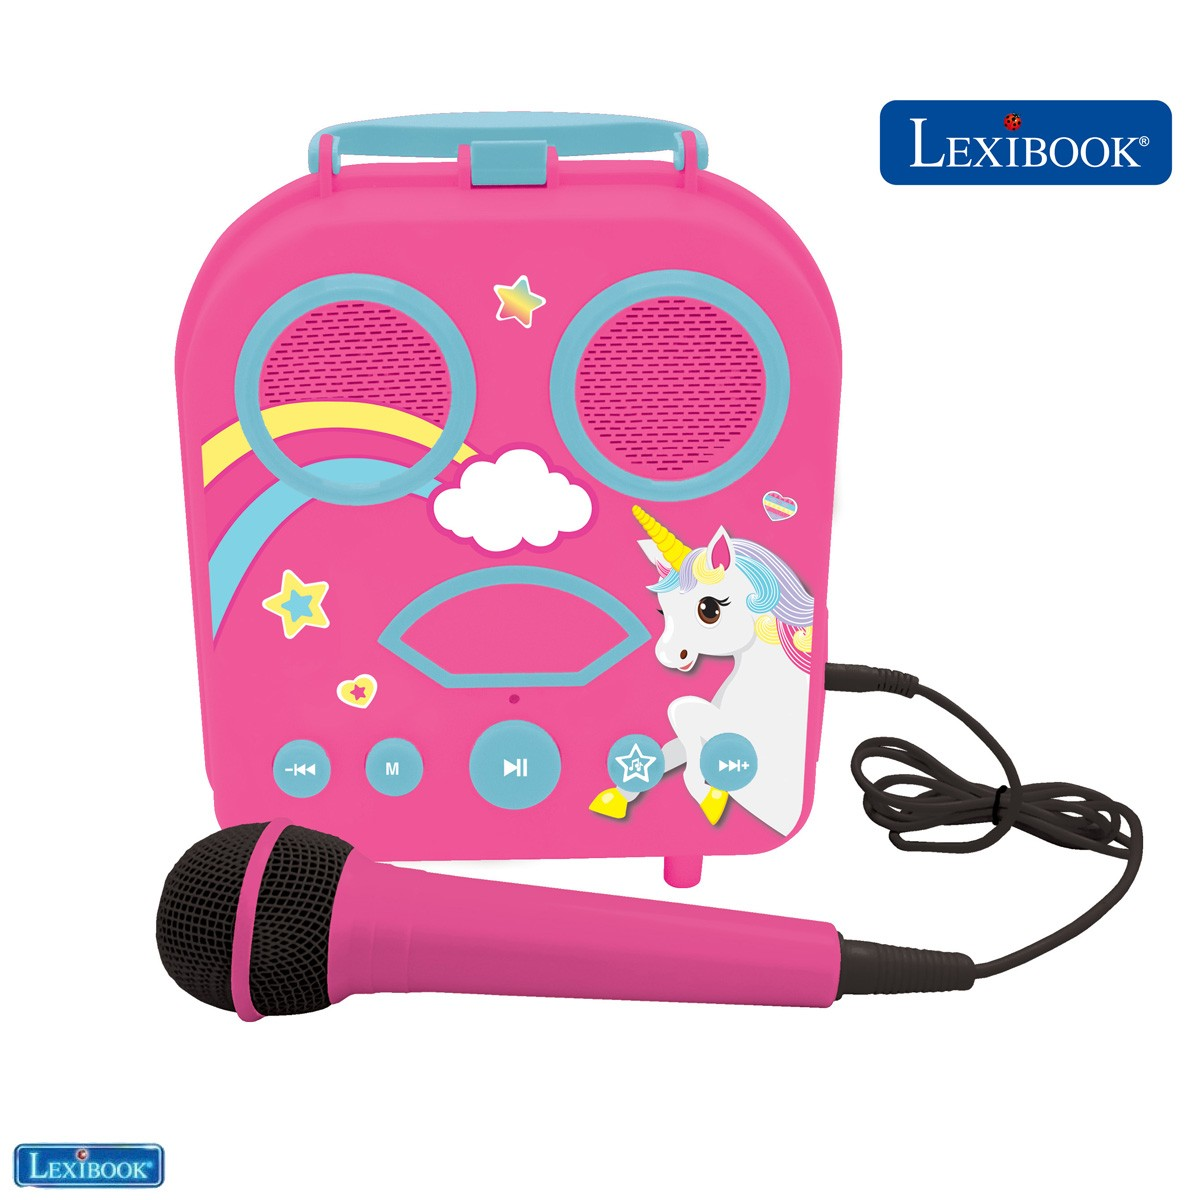 Karaoke portatile con microfono